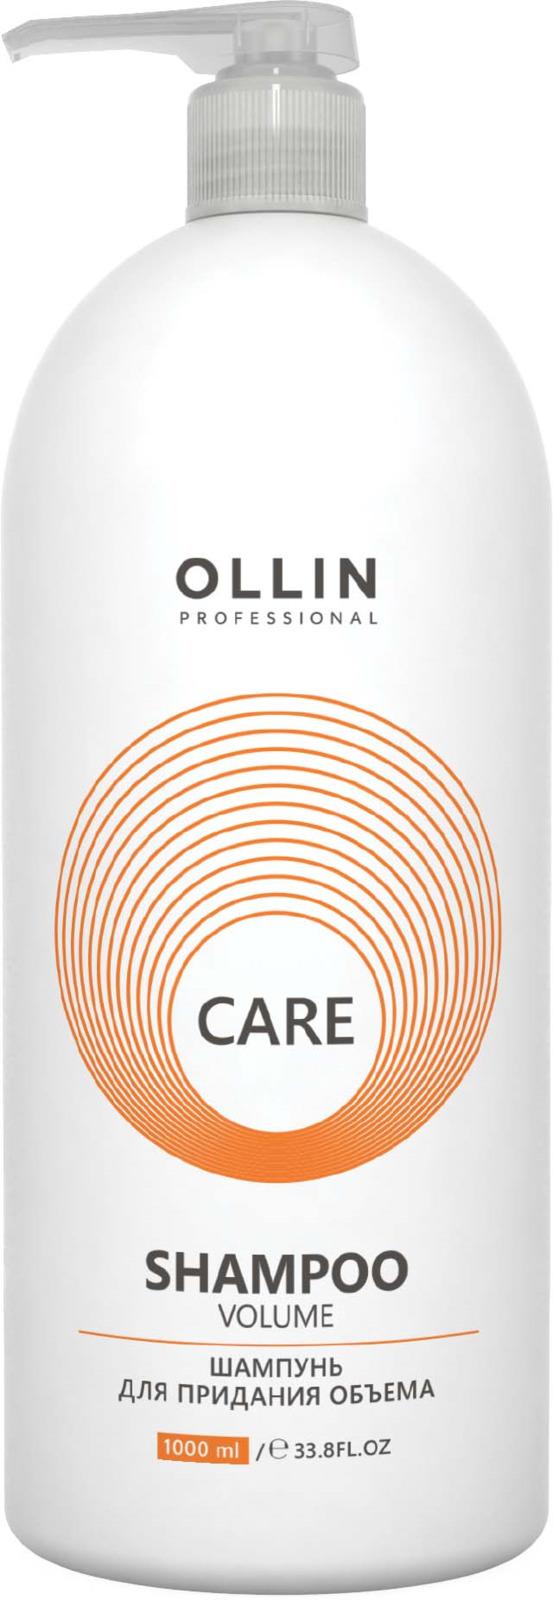 Ollin Шампунь для придания объема Care Volume Shampoo 1000 мл ollin шампунь для придания объема ollin care volume shampoo 721432 1000 мл